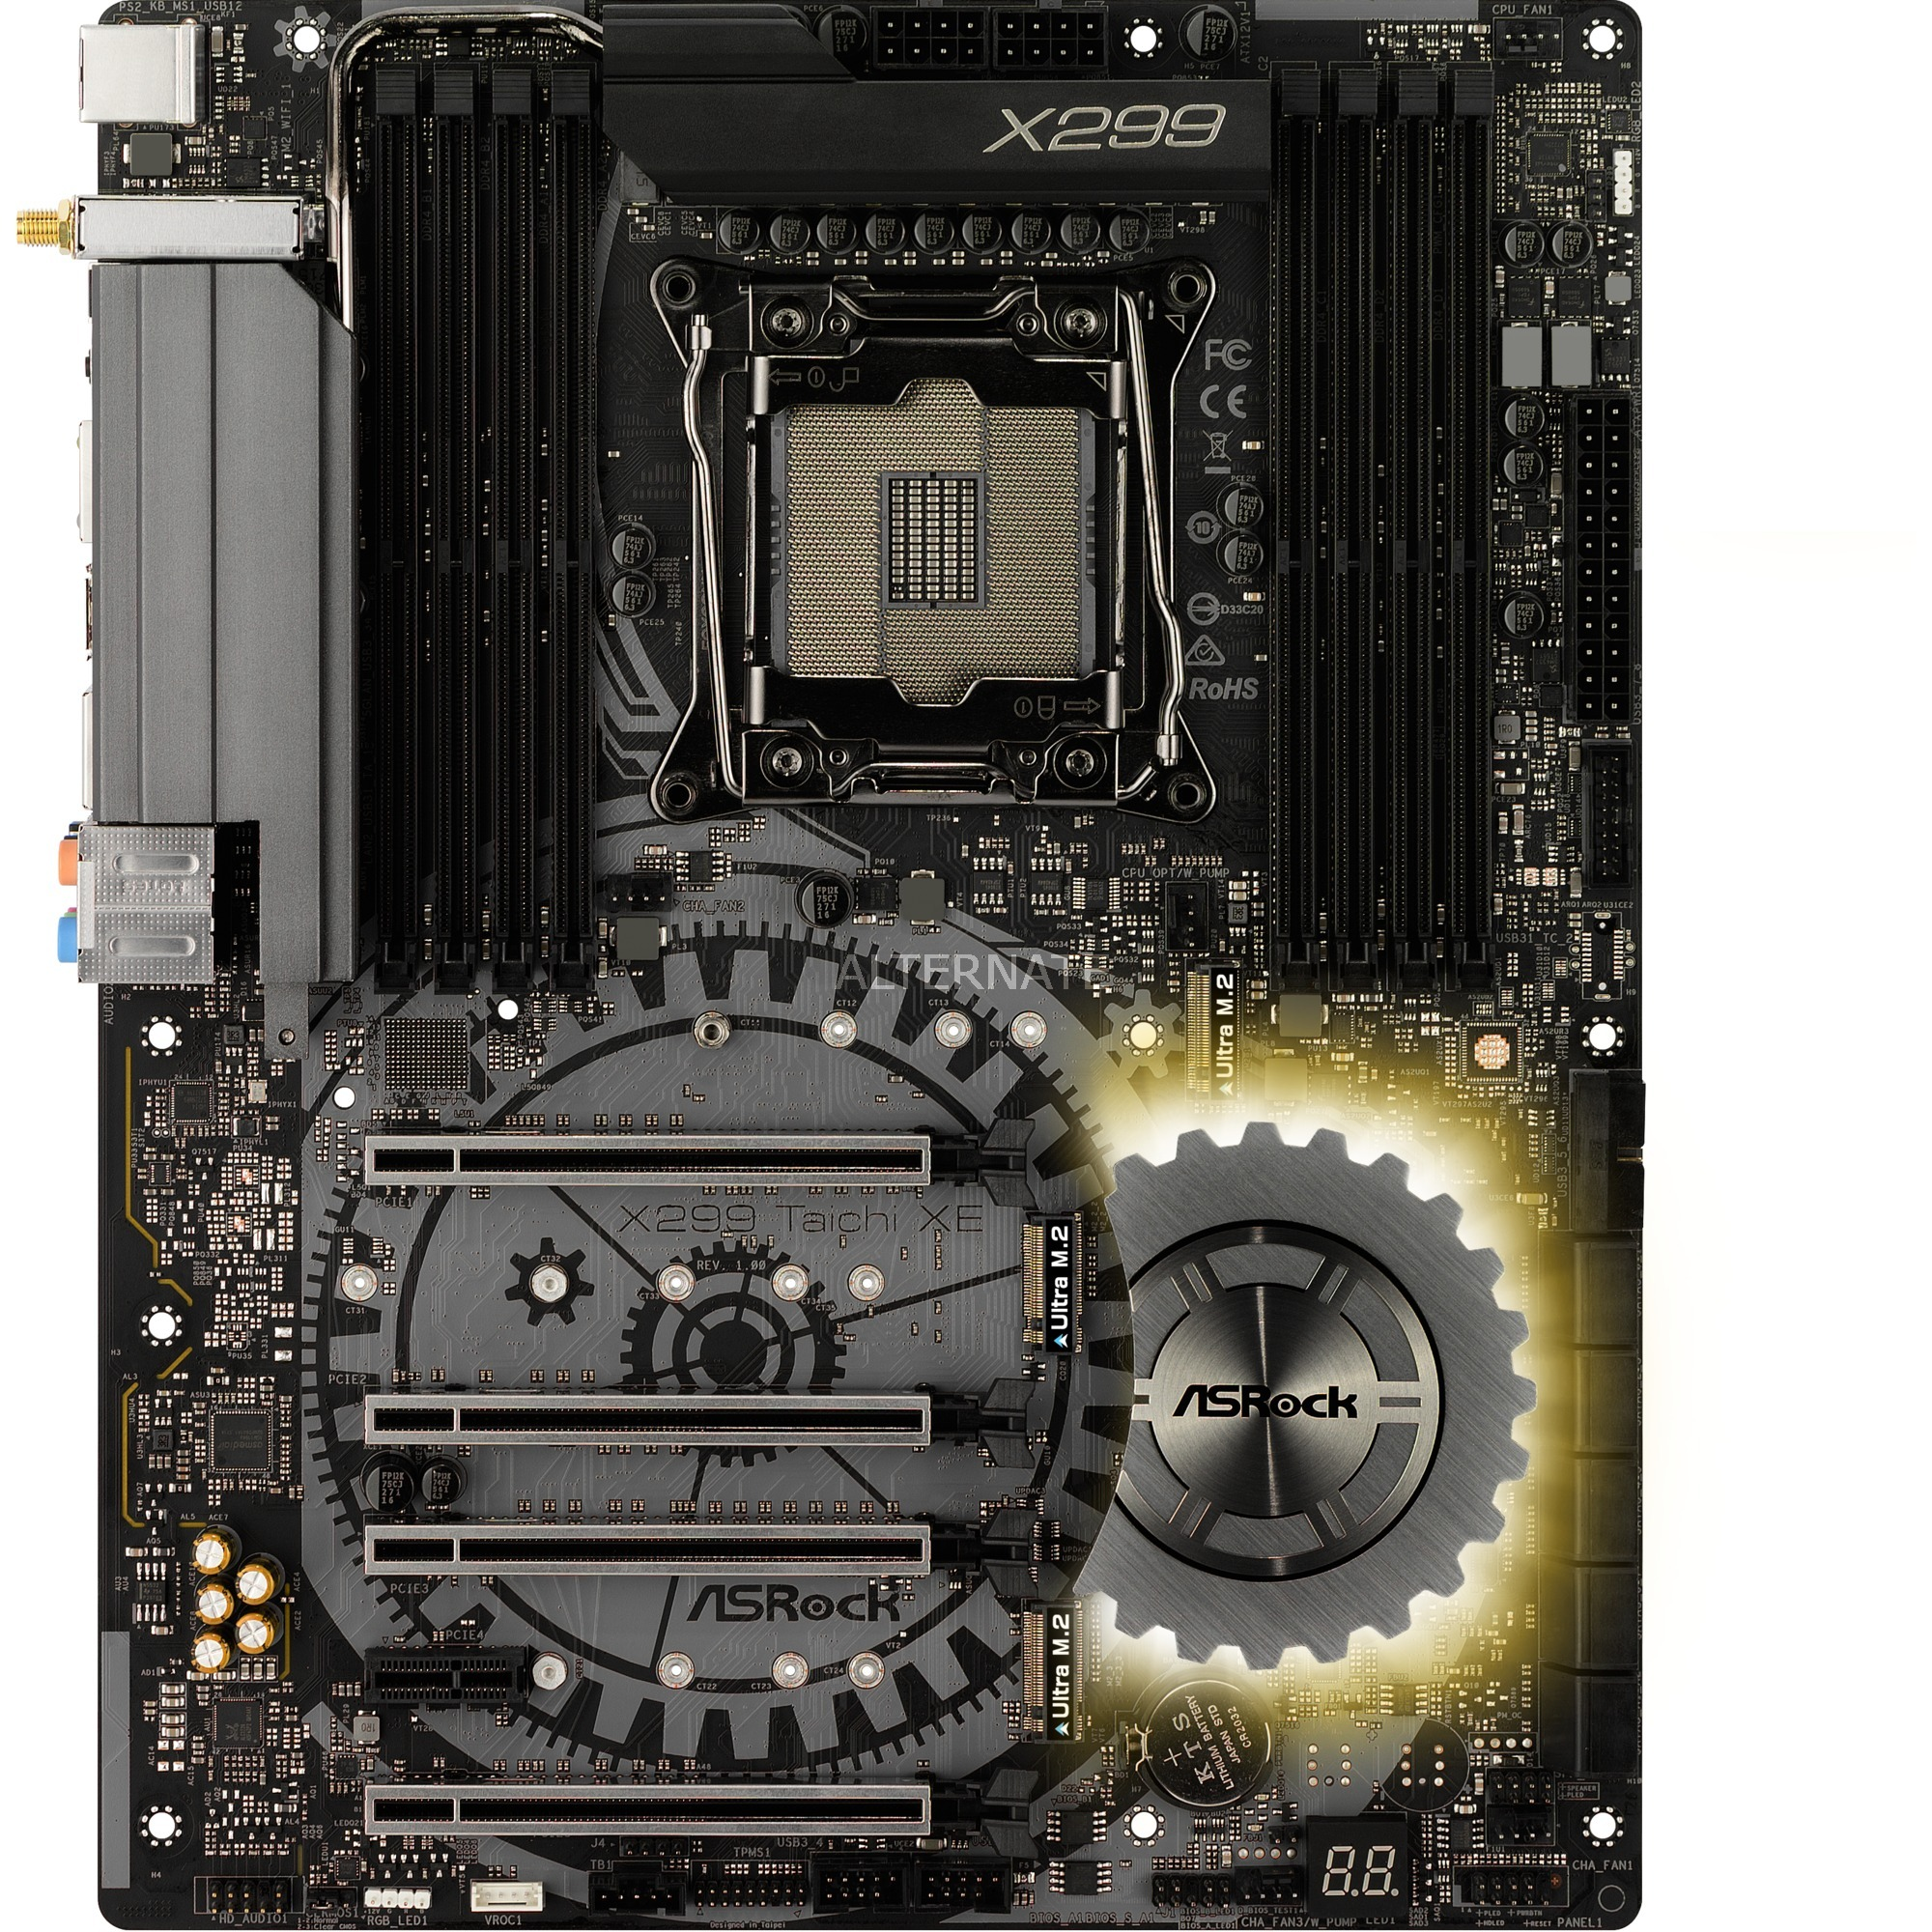 90-MXB6J0-A0UAYZ Intel X299 LGA 2066 ATX placa base